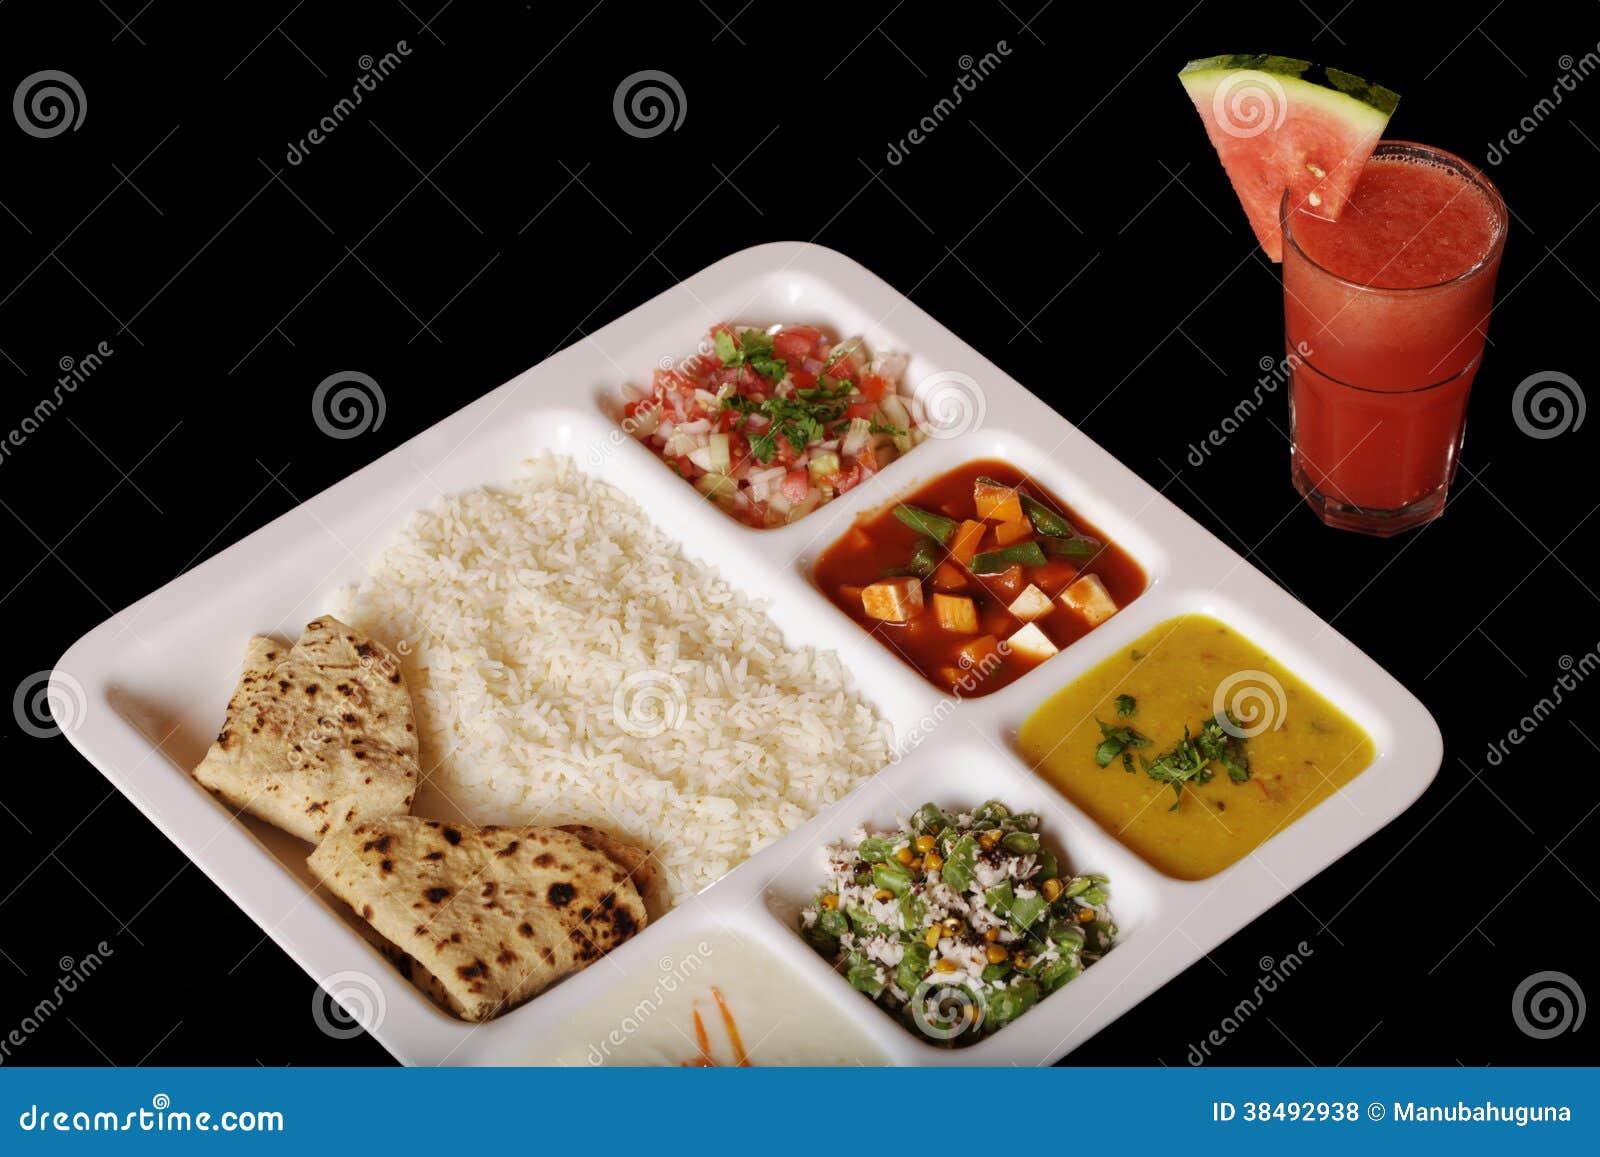 Asian Indian Food Graphics